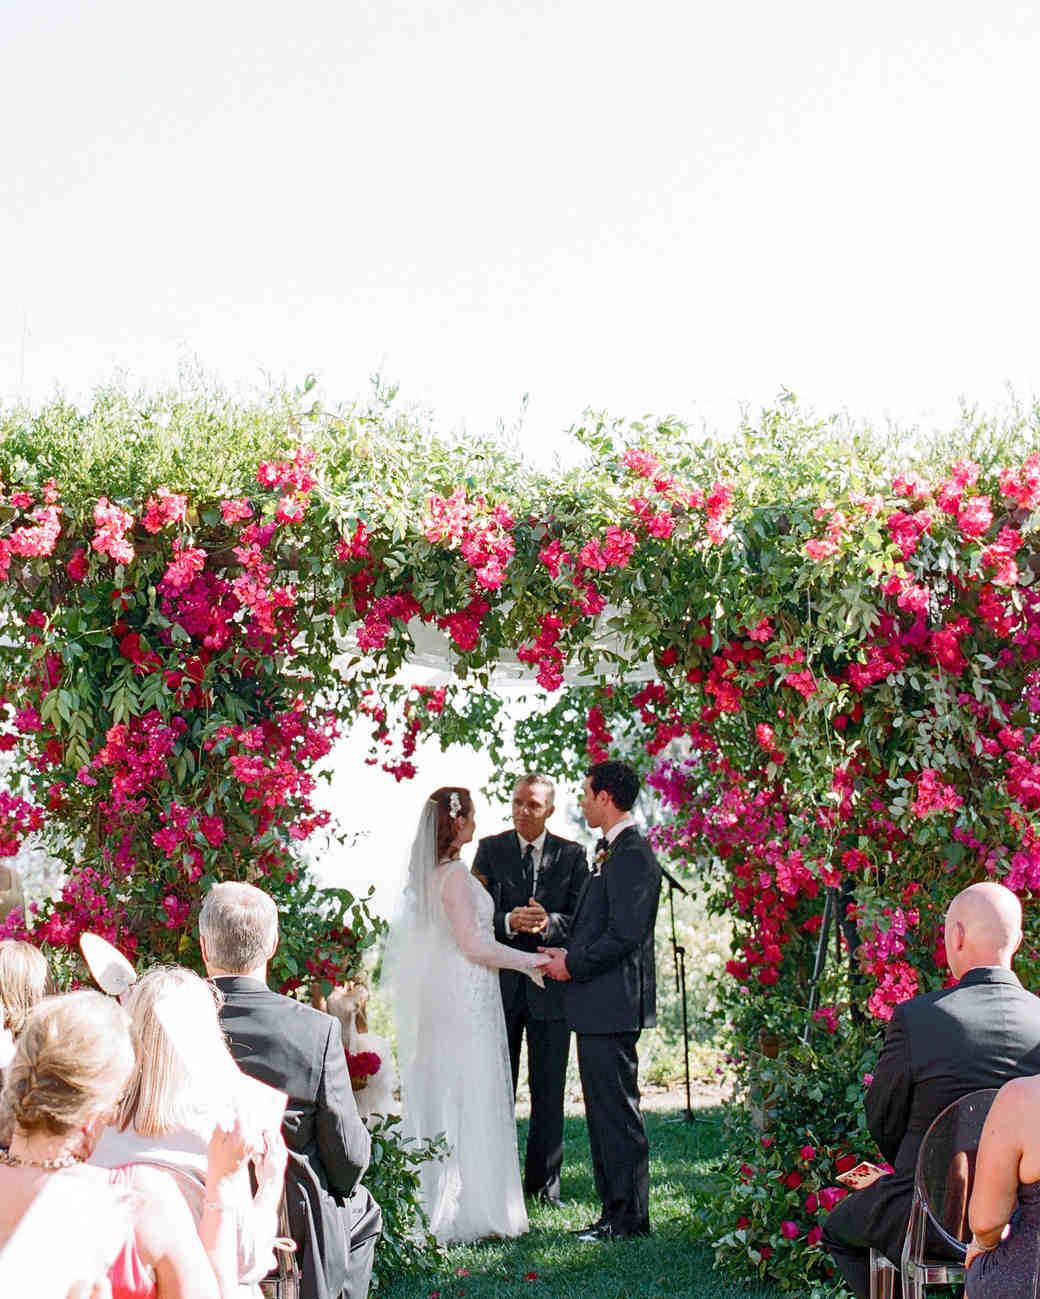 wedding ceremony with arch